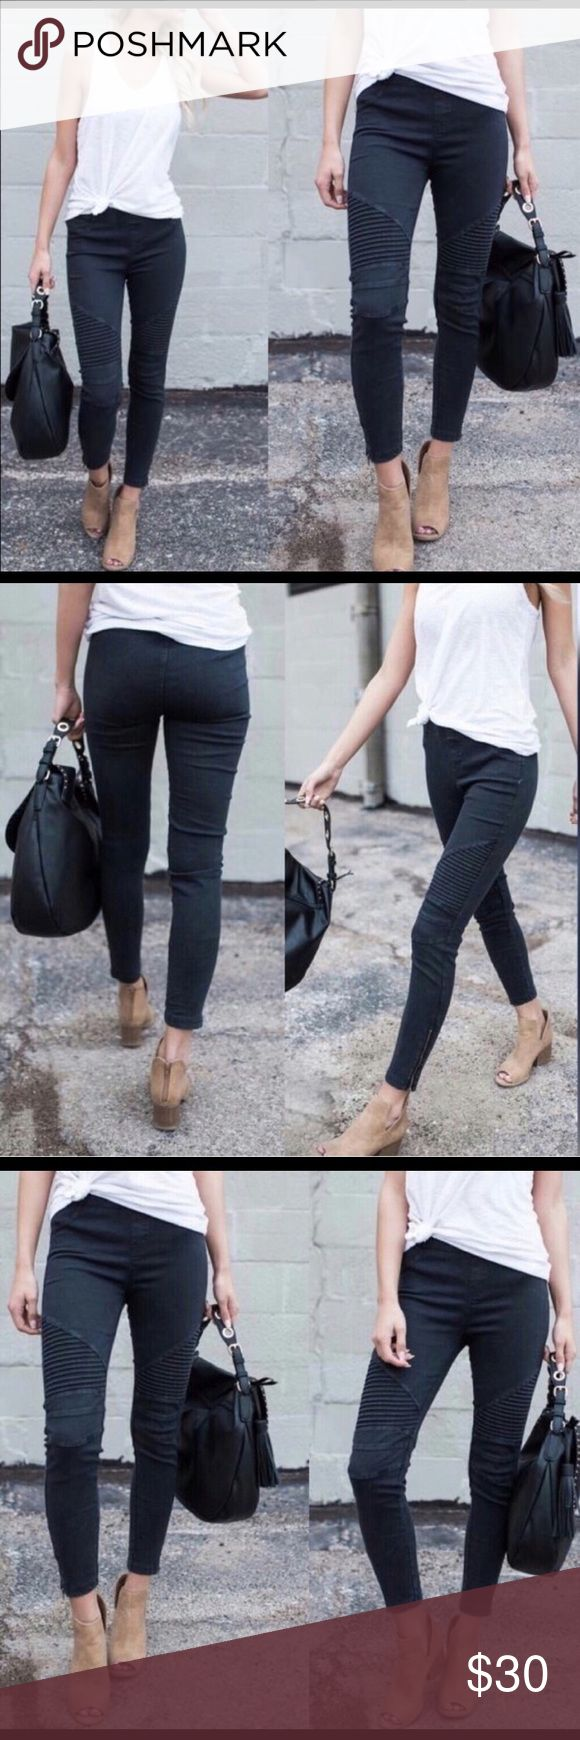 Black Moto Biker Leggings with ankle zip Black biker leggings/pants with ankle zippers, elastic waist, no pockets, thick high quality blend of cotton/nylon/spandex. Pants Leggings